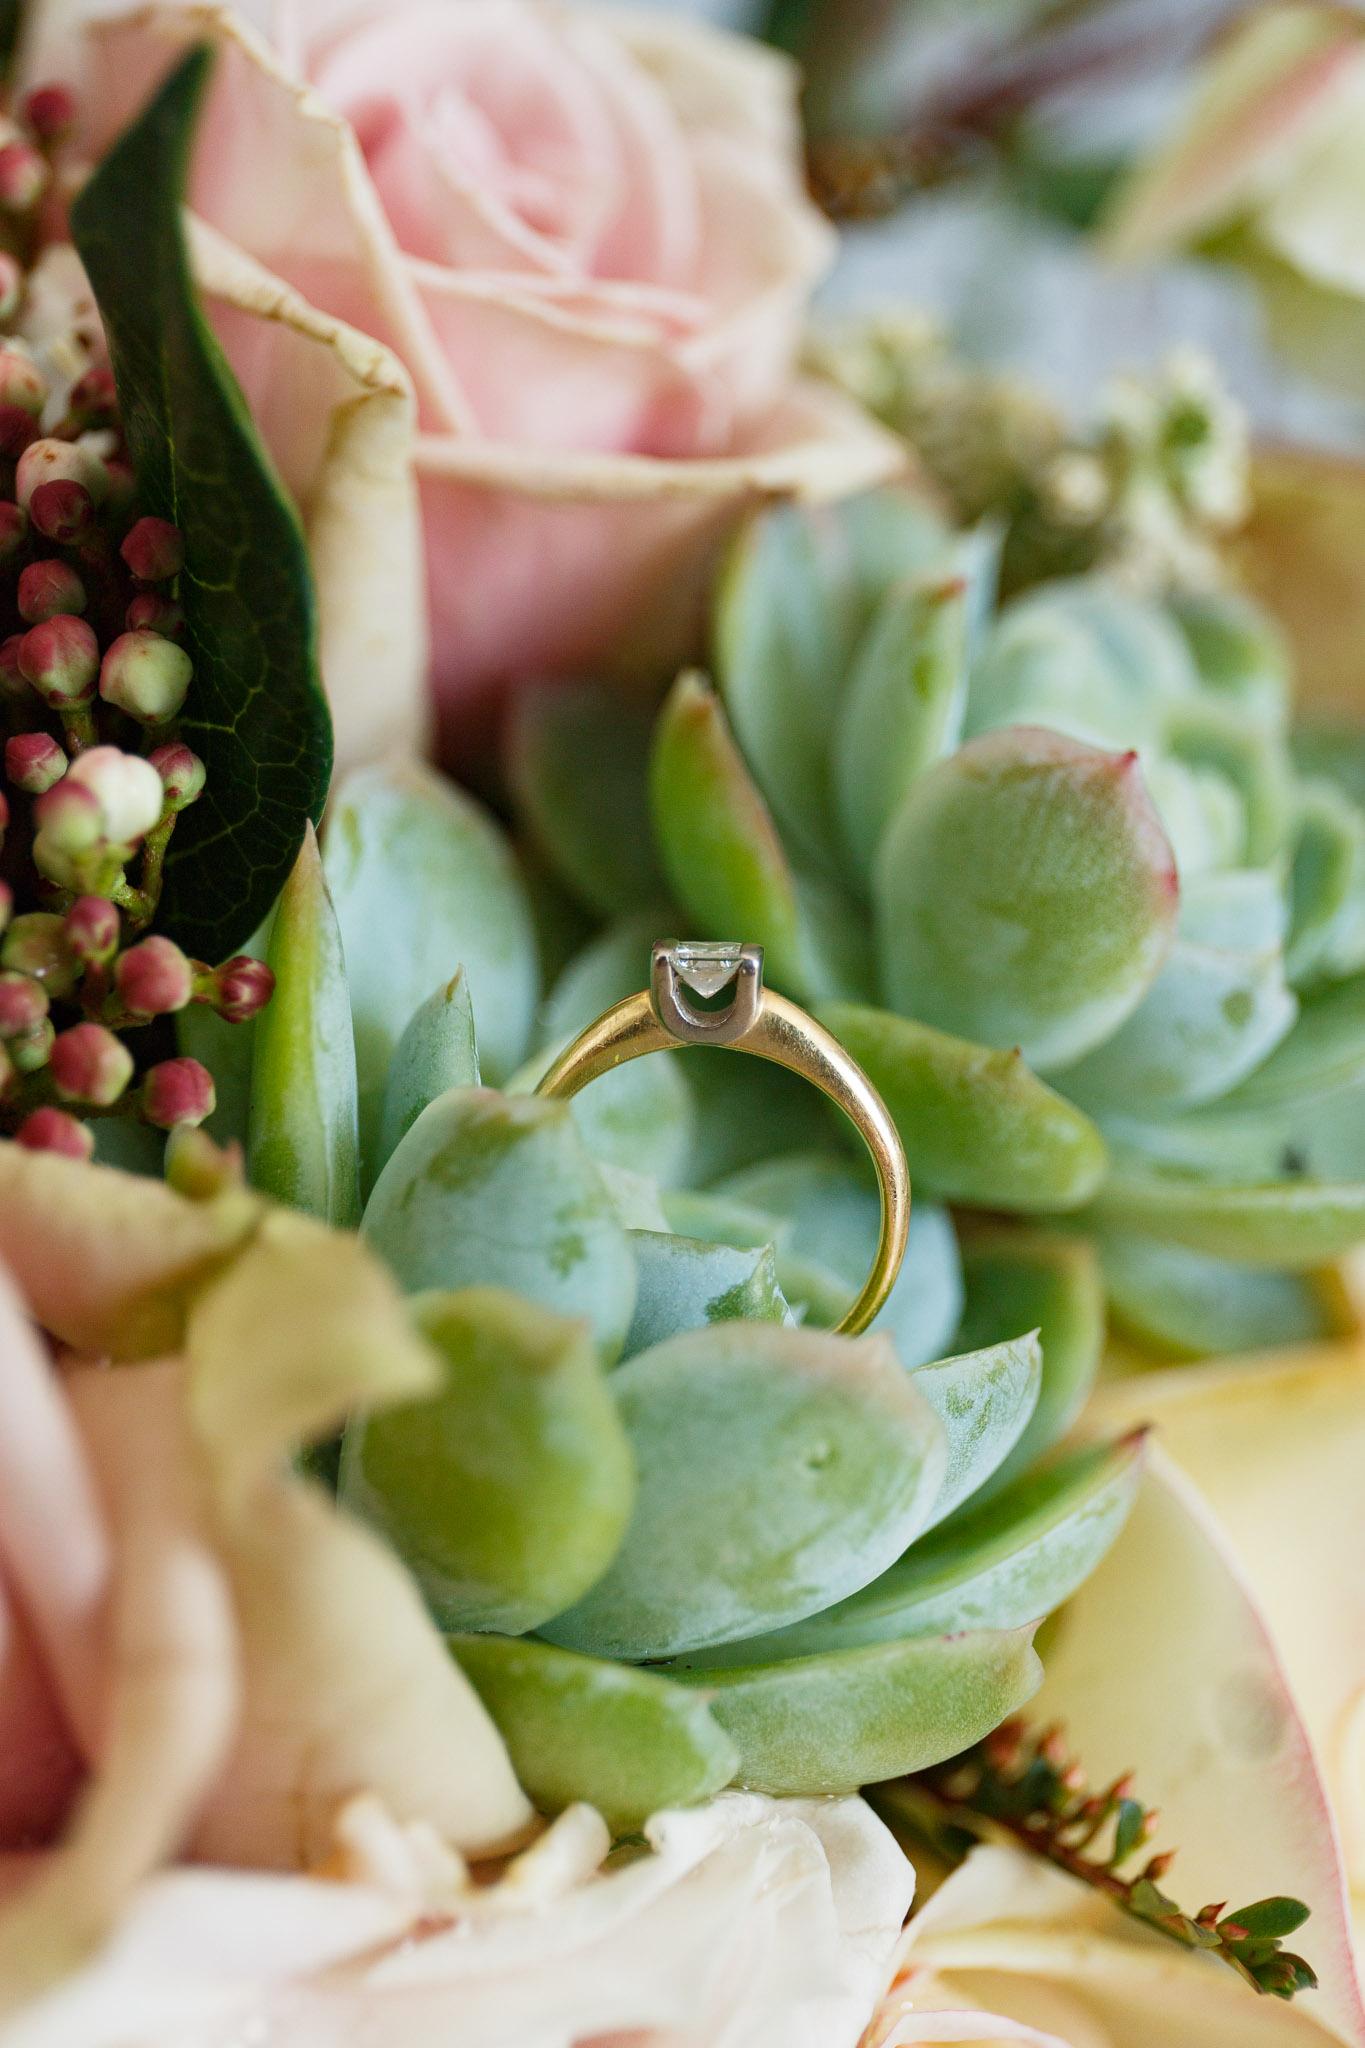 highlight_wedding_photography_manawatu_palmerston_north_new_zealand_rangitikei_golf_ohakea-4.jpg